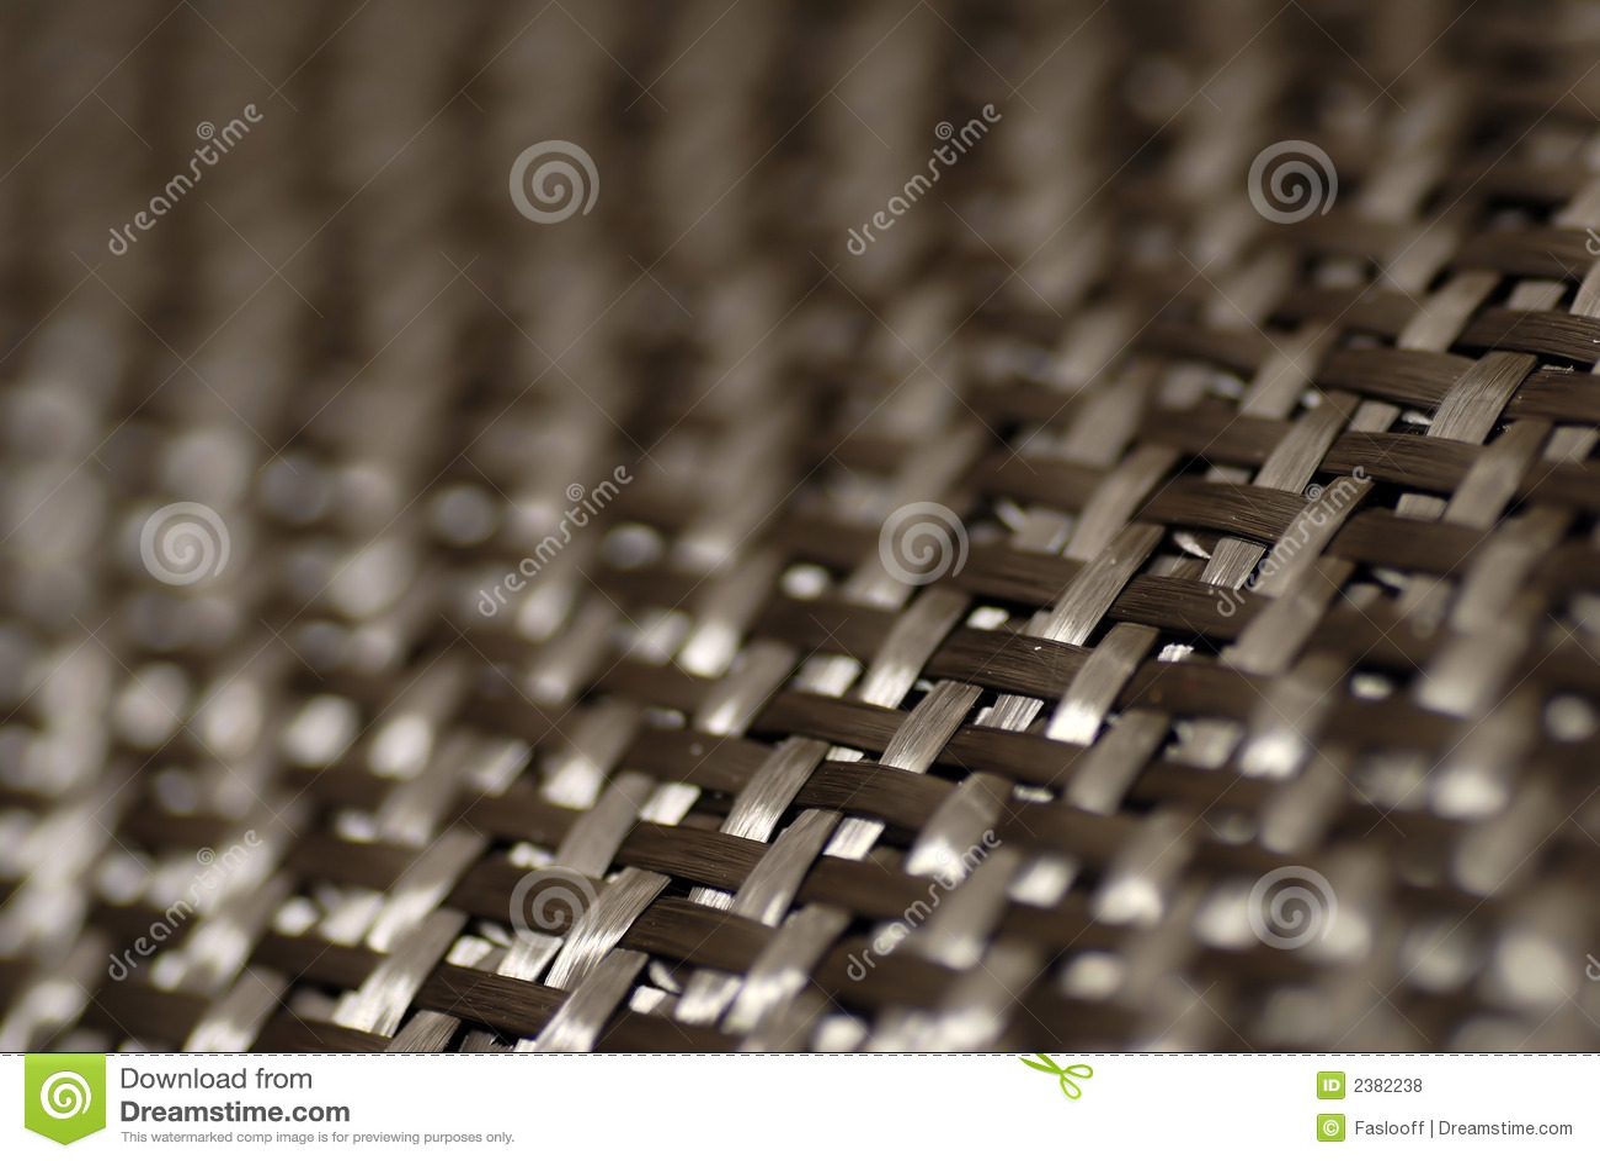 Configuration de fibre de carbone